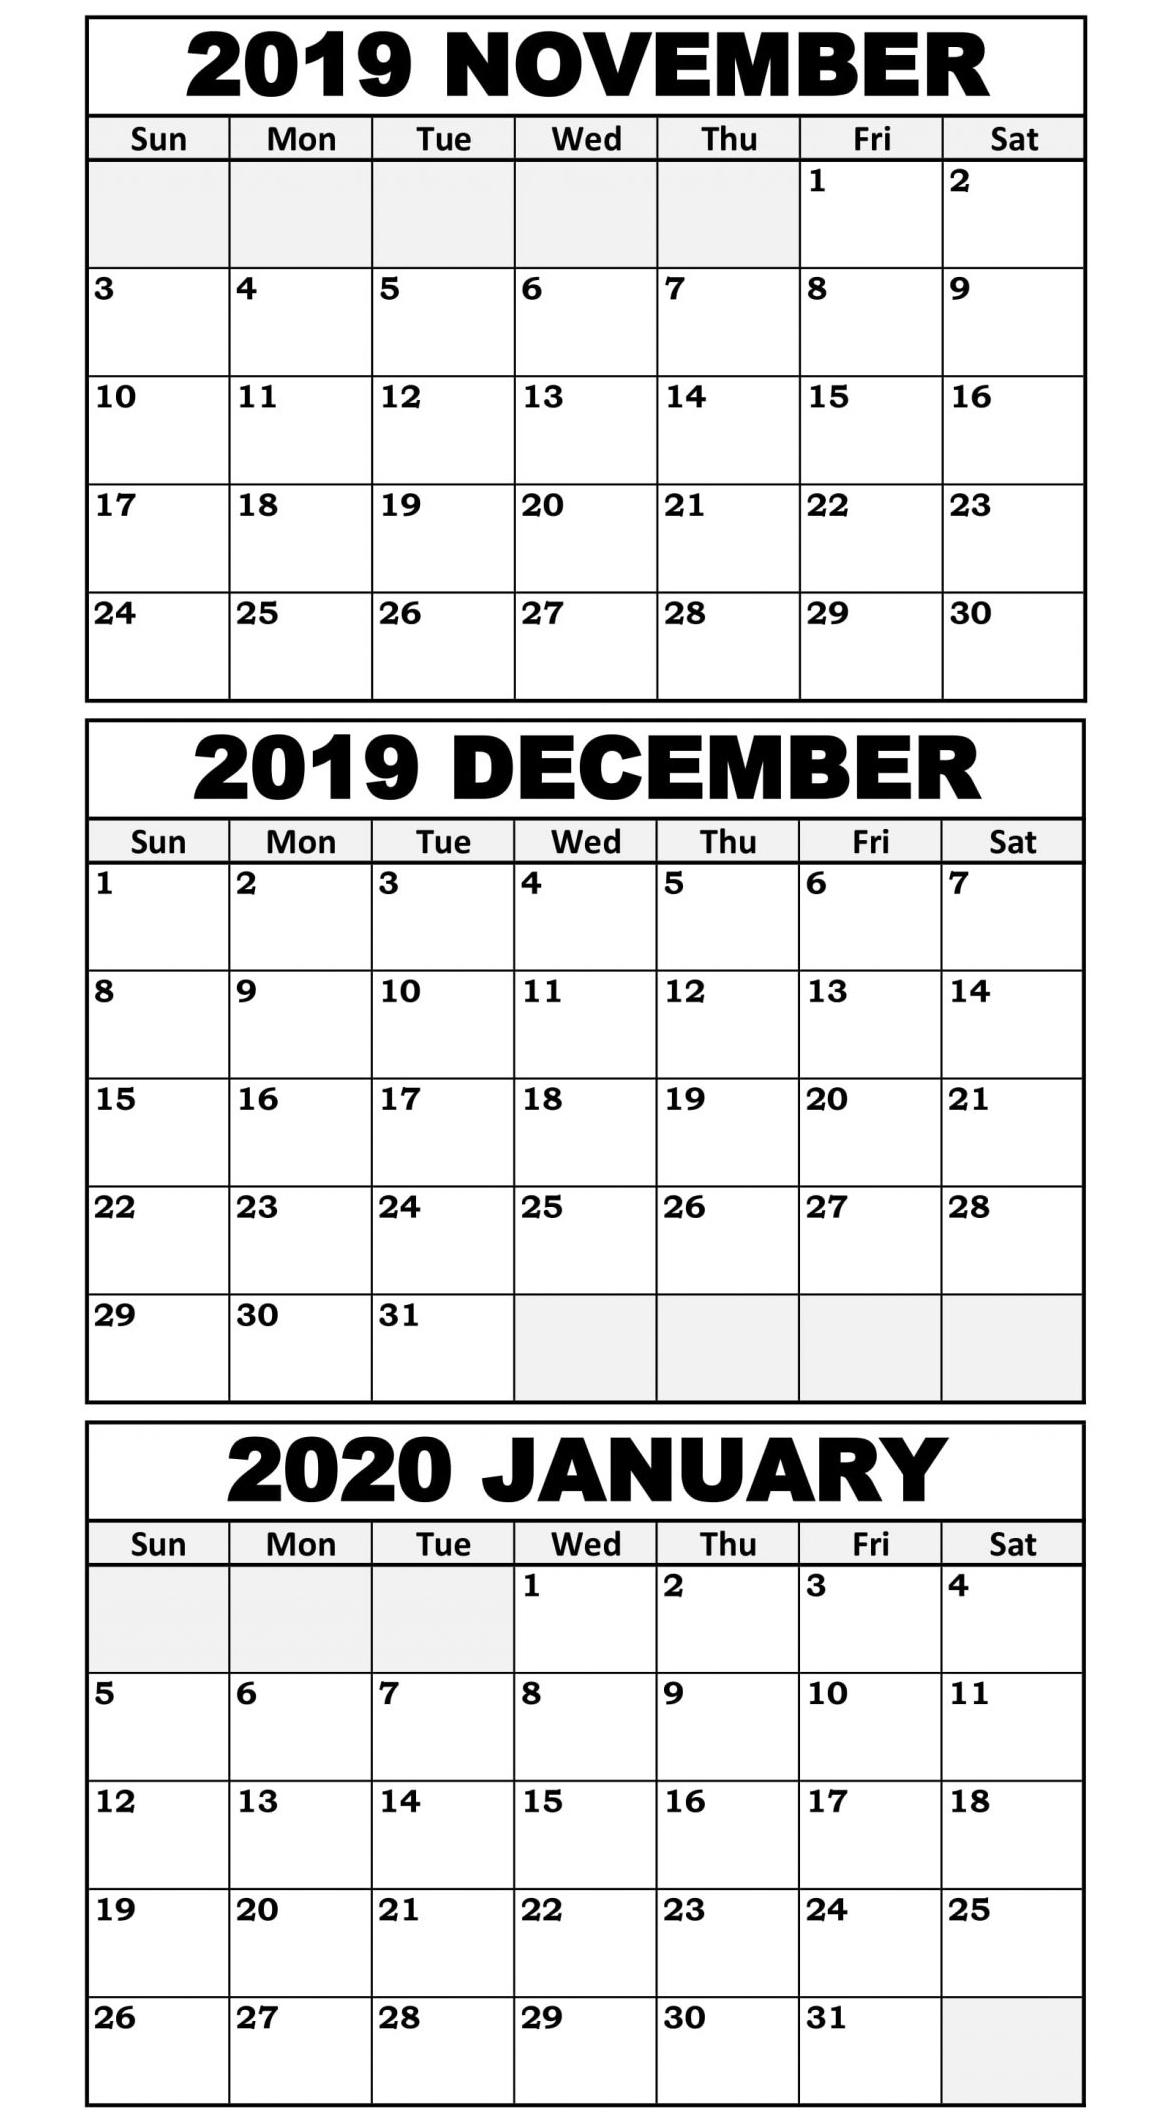 November 2019 To January 2020 Calendar Template - 2019